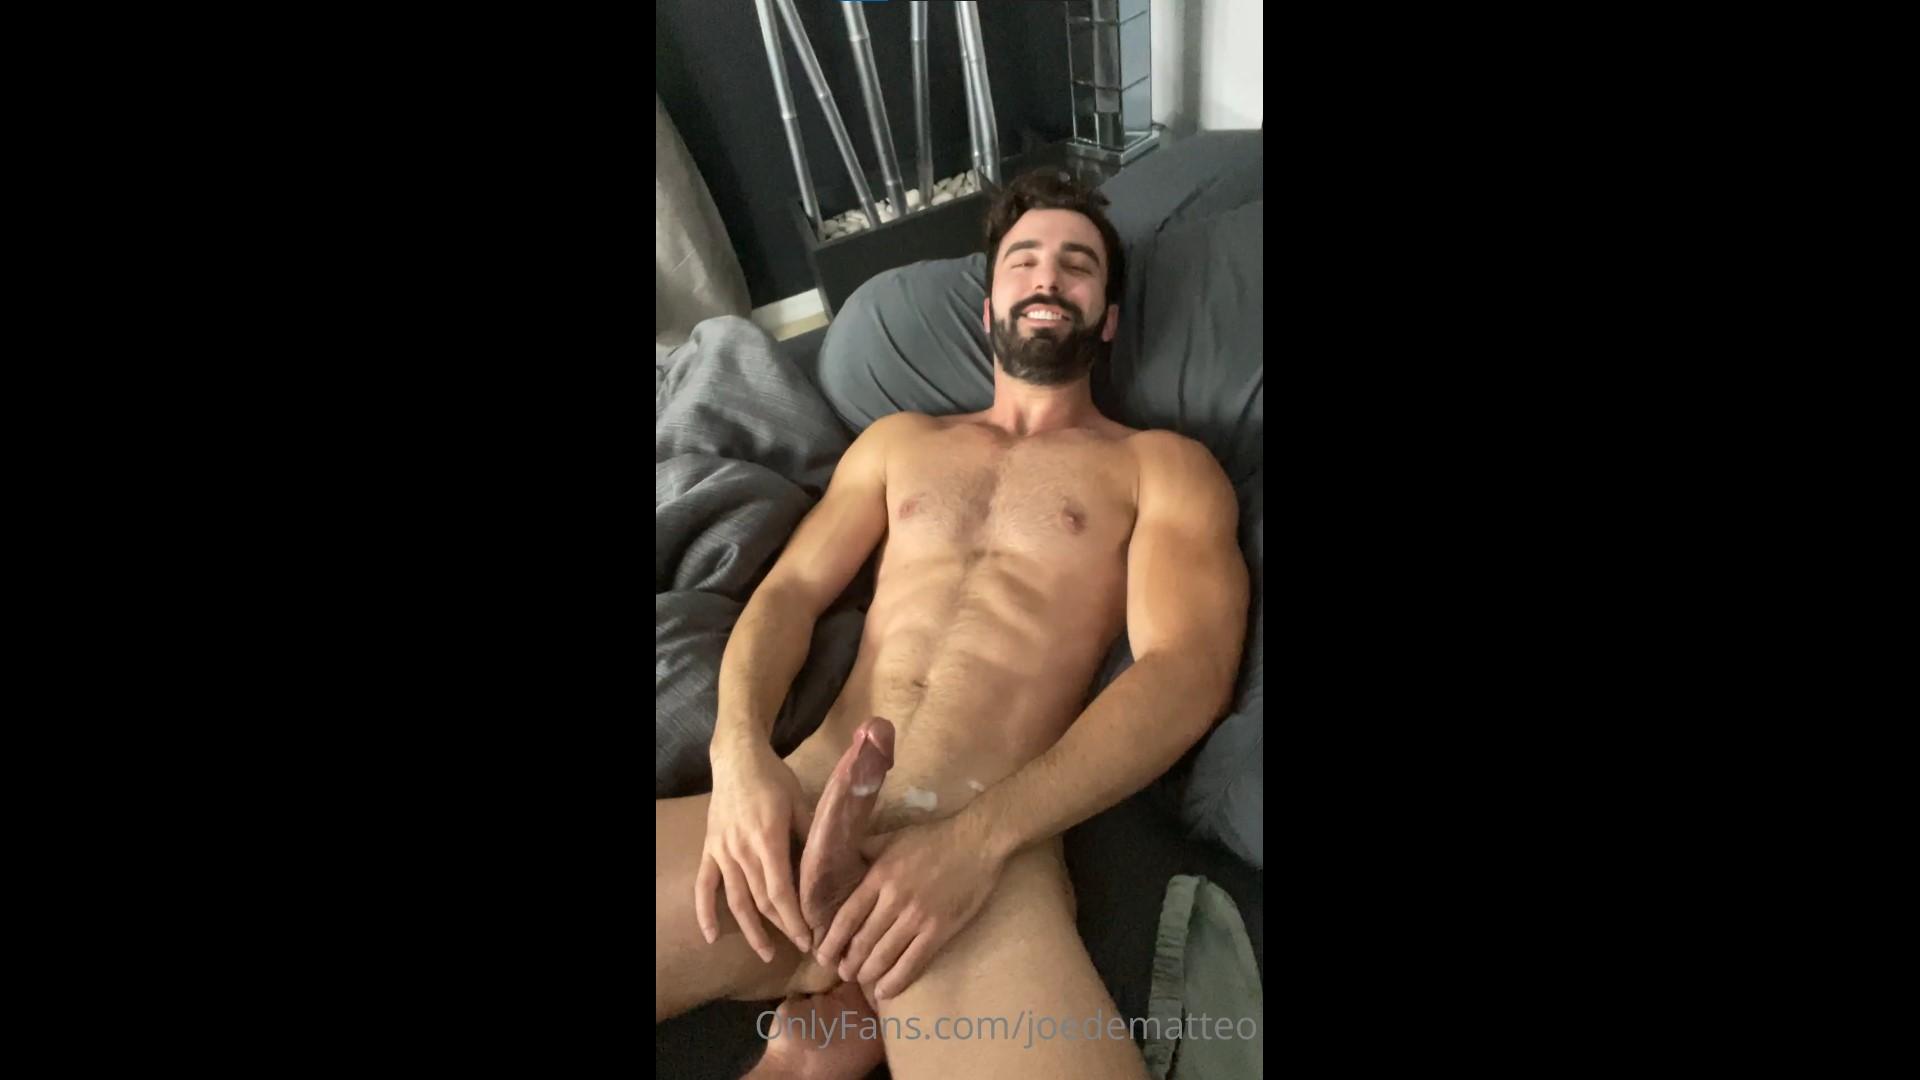 Kaden Hylls (LetsEatCakeXx) sucks my dick and plays with my ass till I cum - Joe DeMatteo